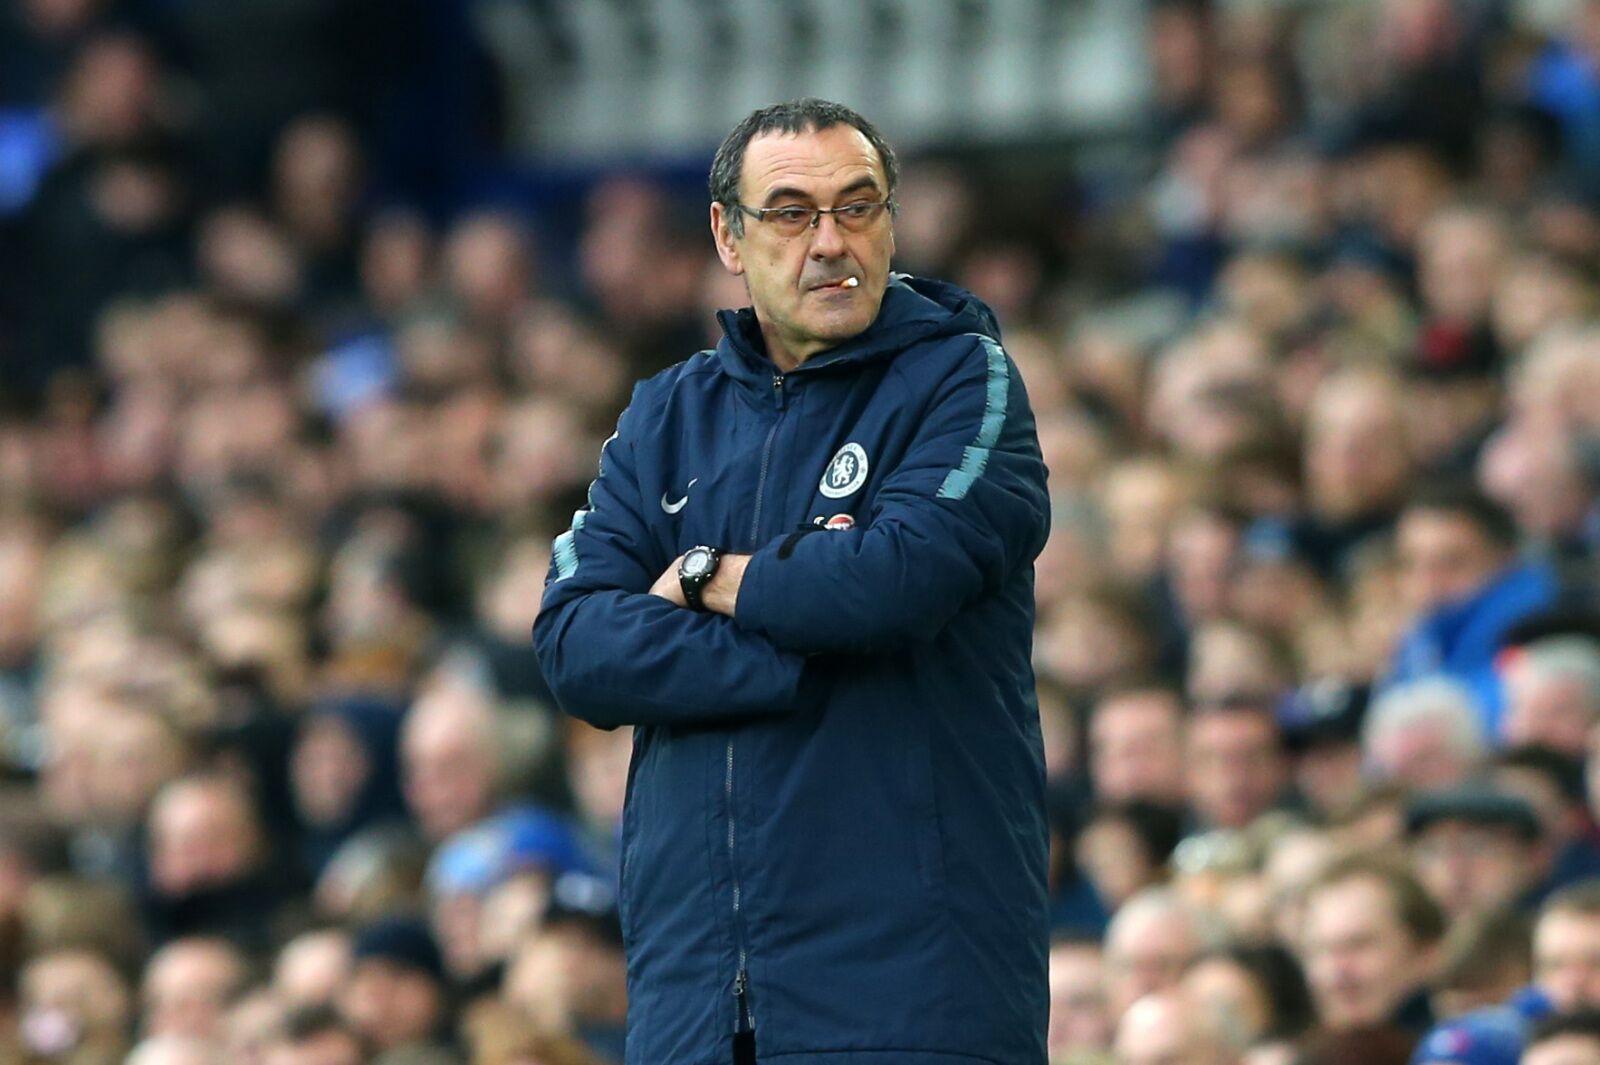 Chelsea fans foolishly rewriting Maurizio Sarri narrative to cast him as a martyr